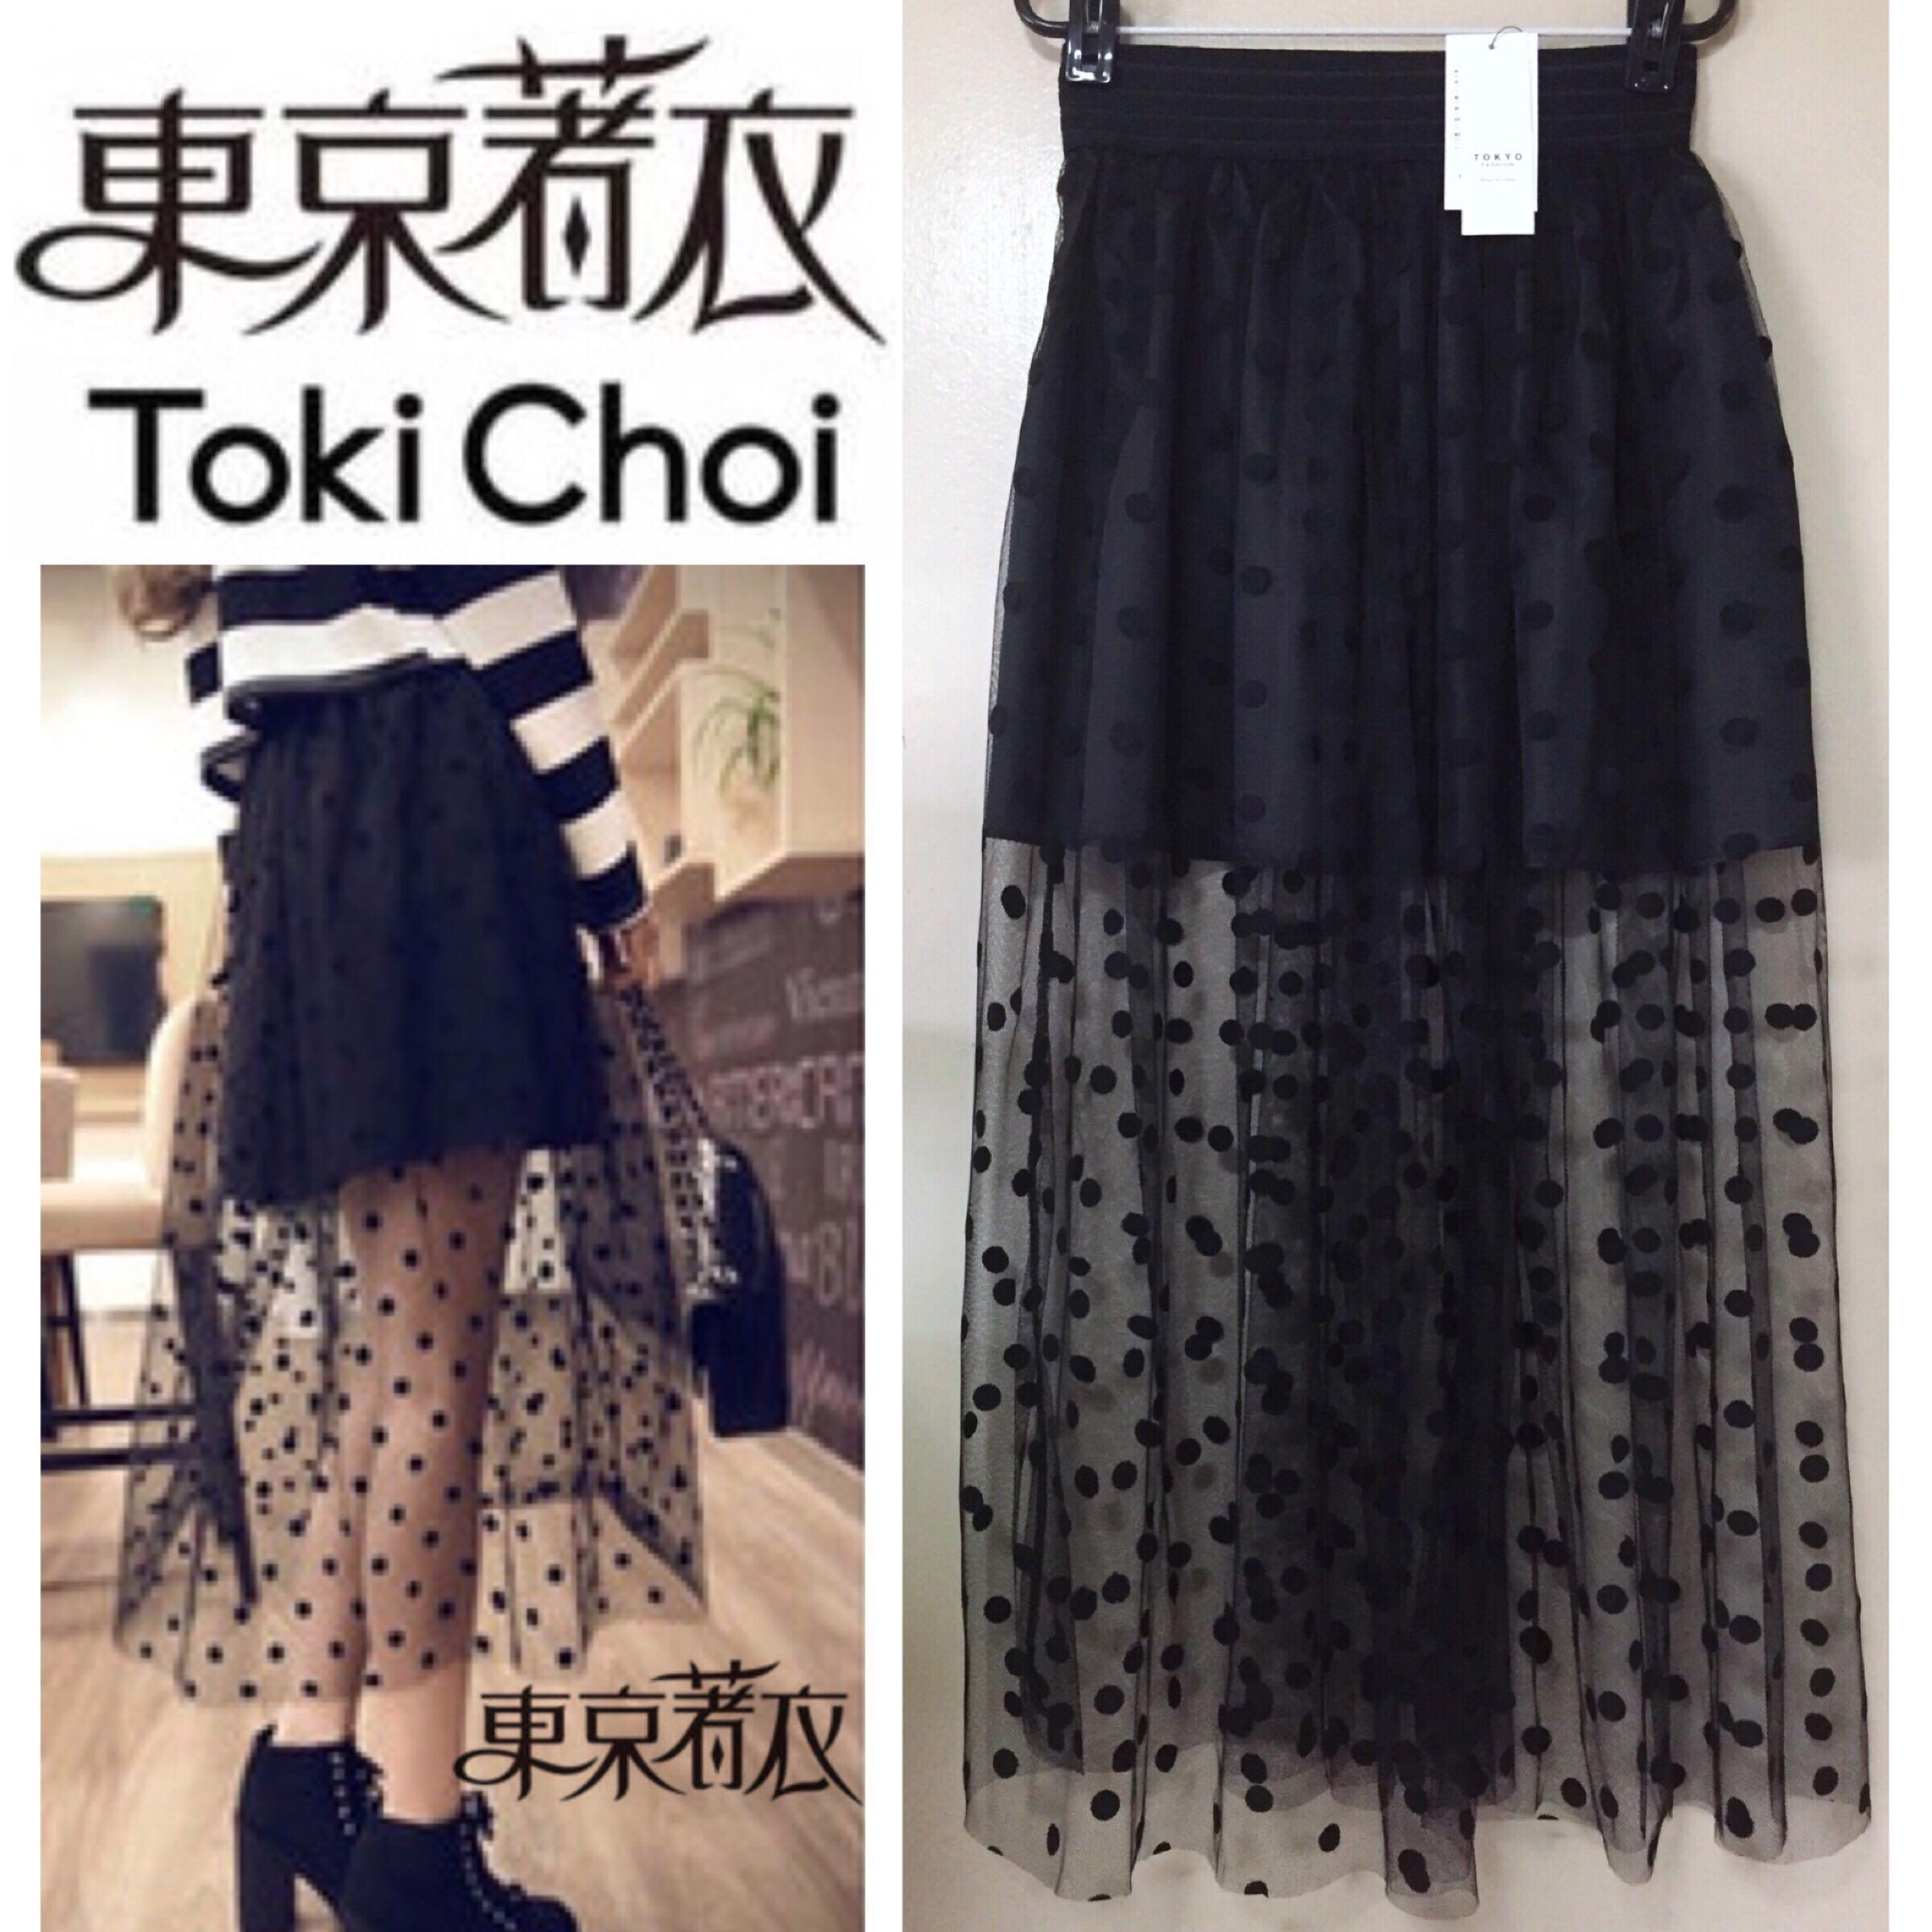 7a6ccddc1e ✨BNWT TOKYO FASHION Black Mesh Overlay Long Midi Skirt/ Polka Dot/ Free  Size Fits UK 8/10/12 Size S/M/L, Women's Fashion, Clothes, Dresses & Skirts  on ...